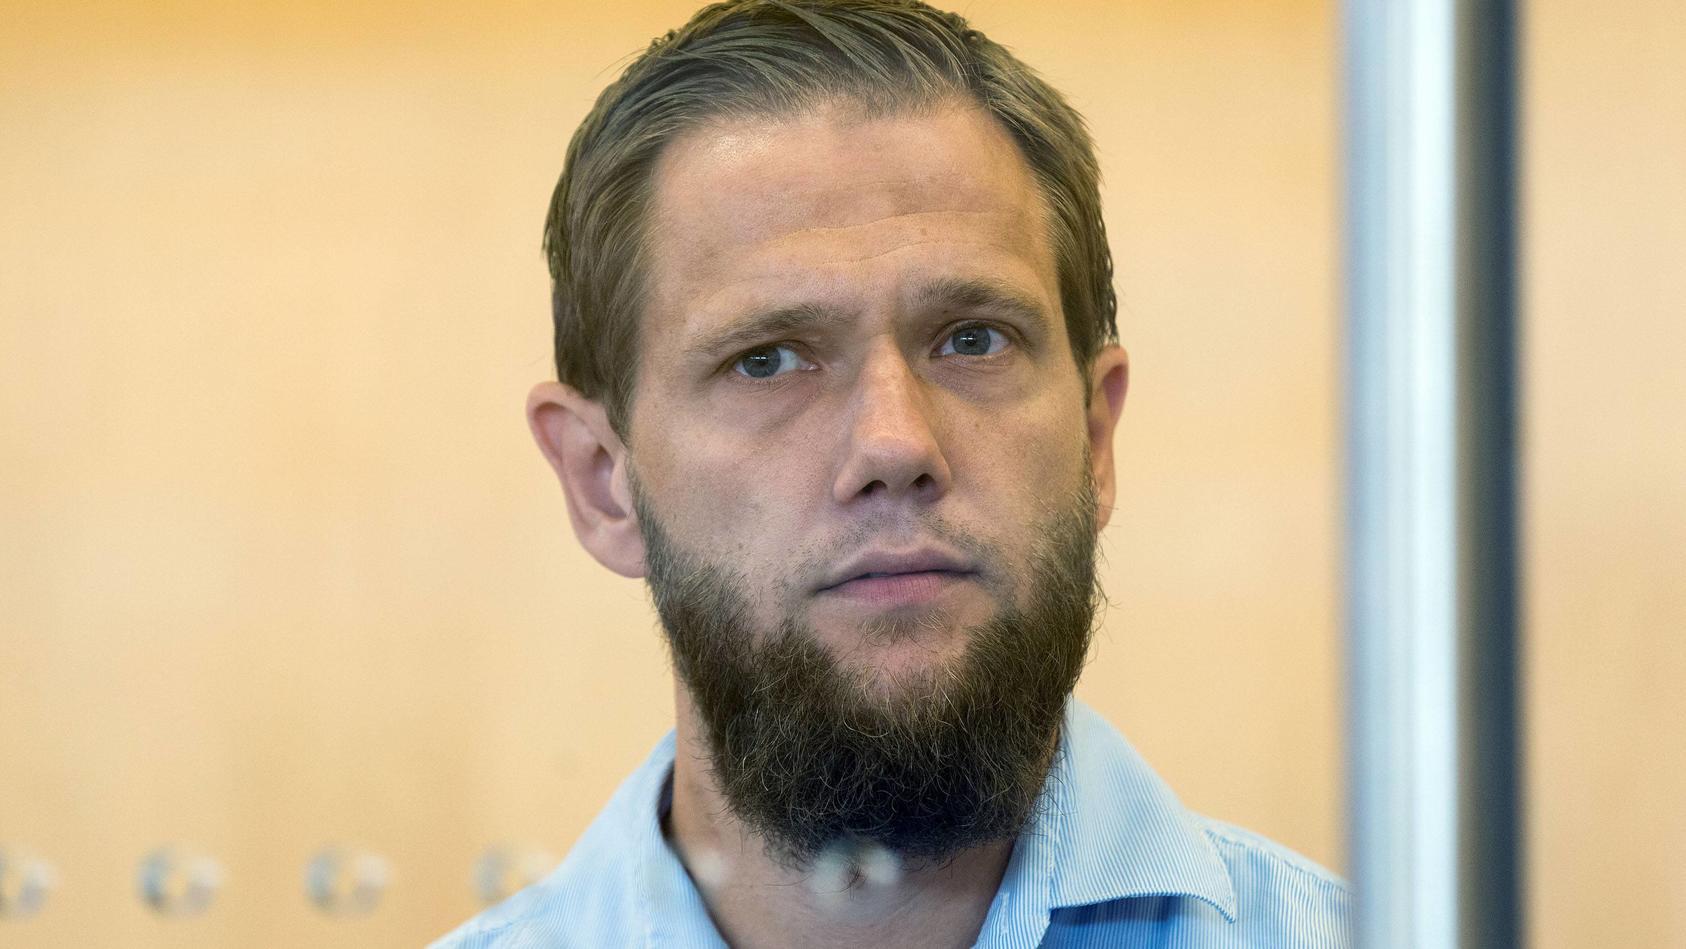 Sven Lau vor dem Düsseldorfer Landgericht.